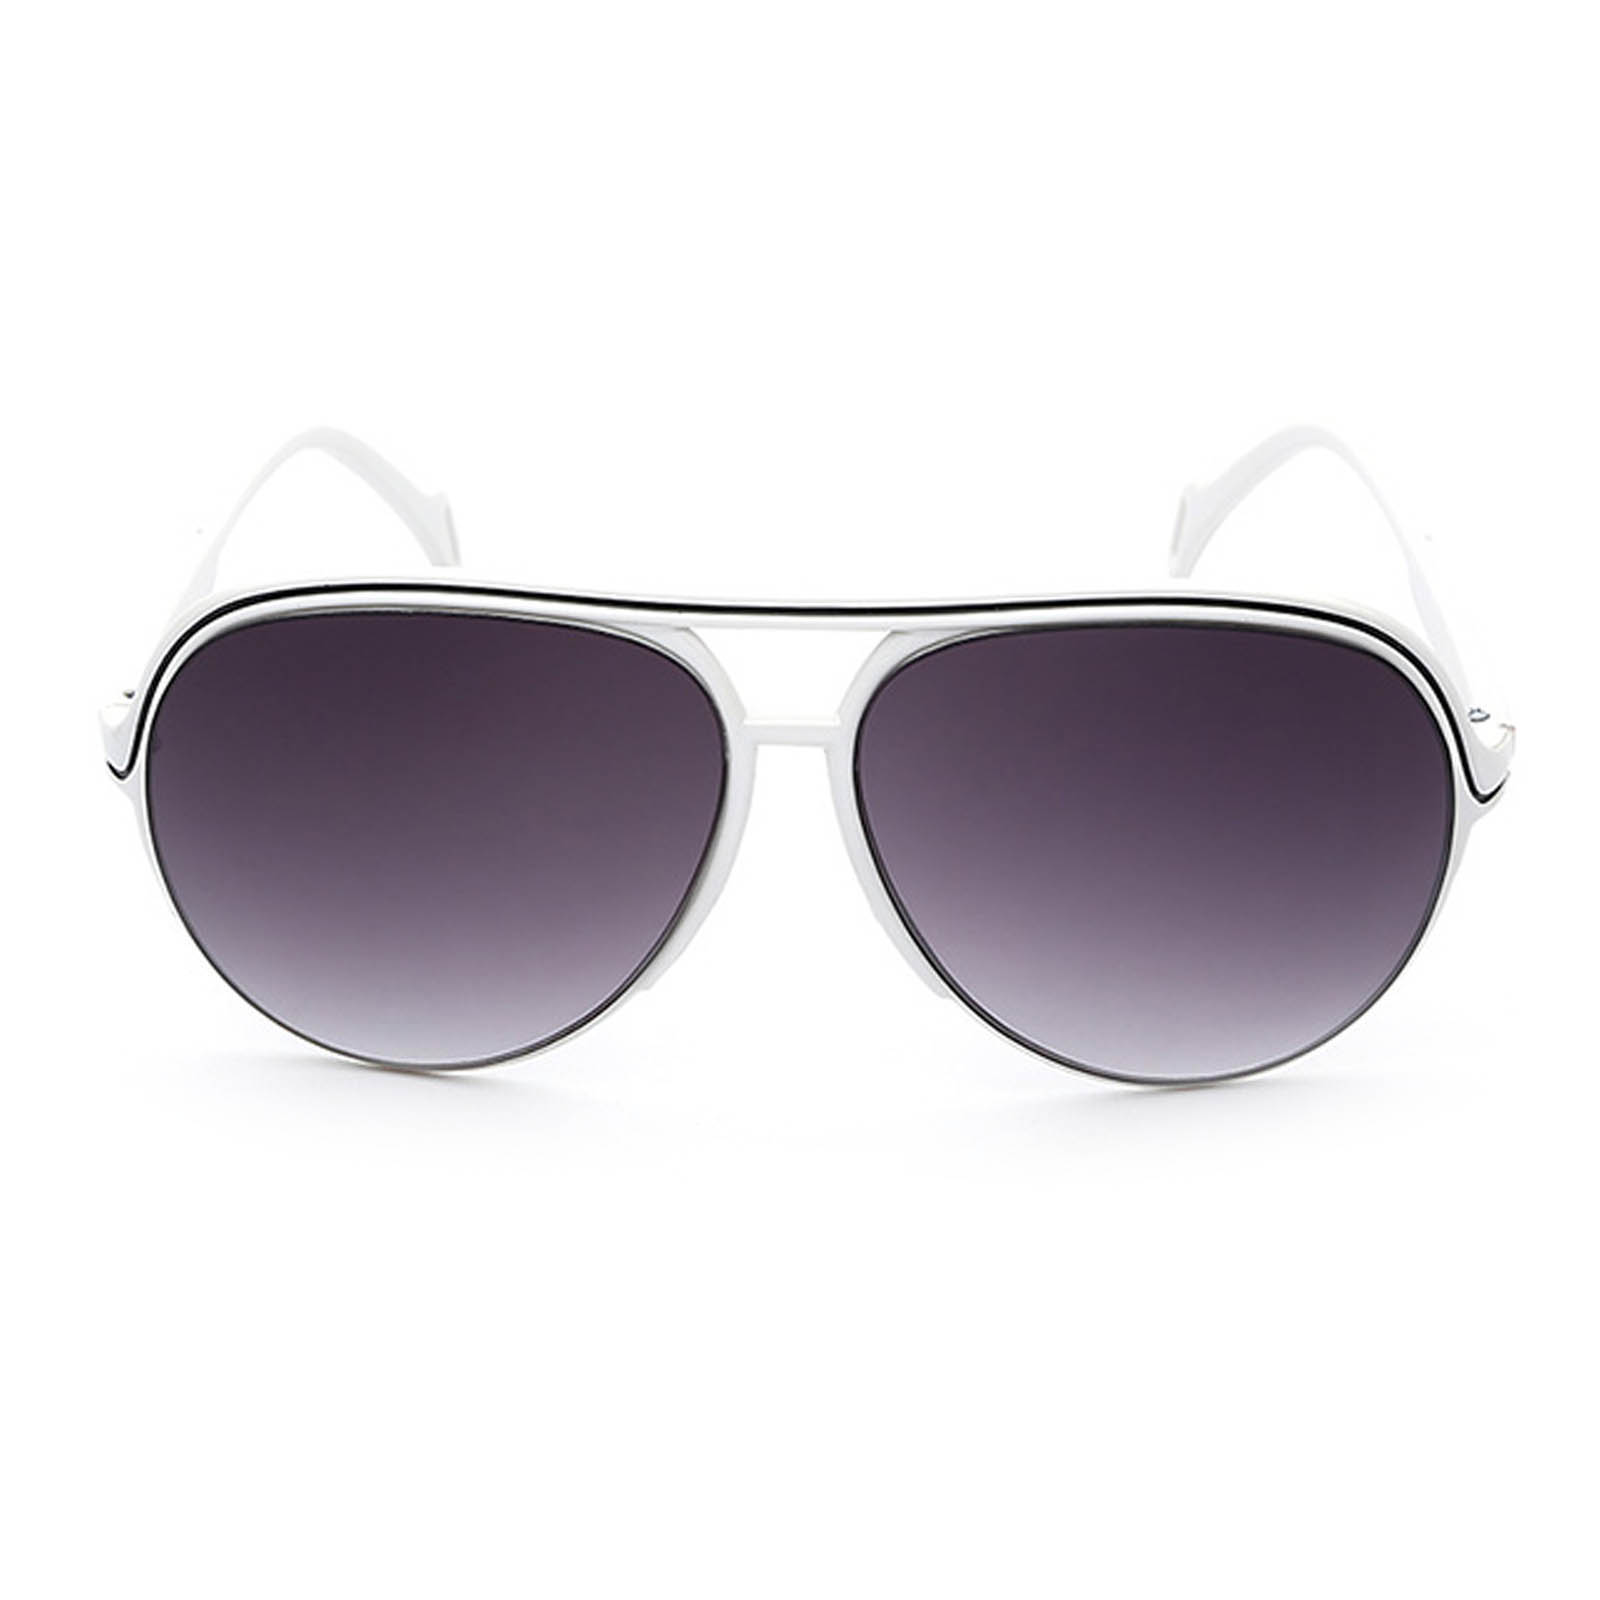 84862240b62 ... OWL ® 047 C2 Aviator Eyewear Sunglasses Women s Men s Plastic White  Frame Smoke Lens One Pair